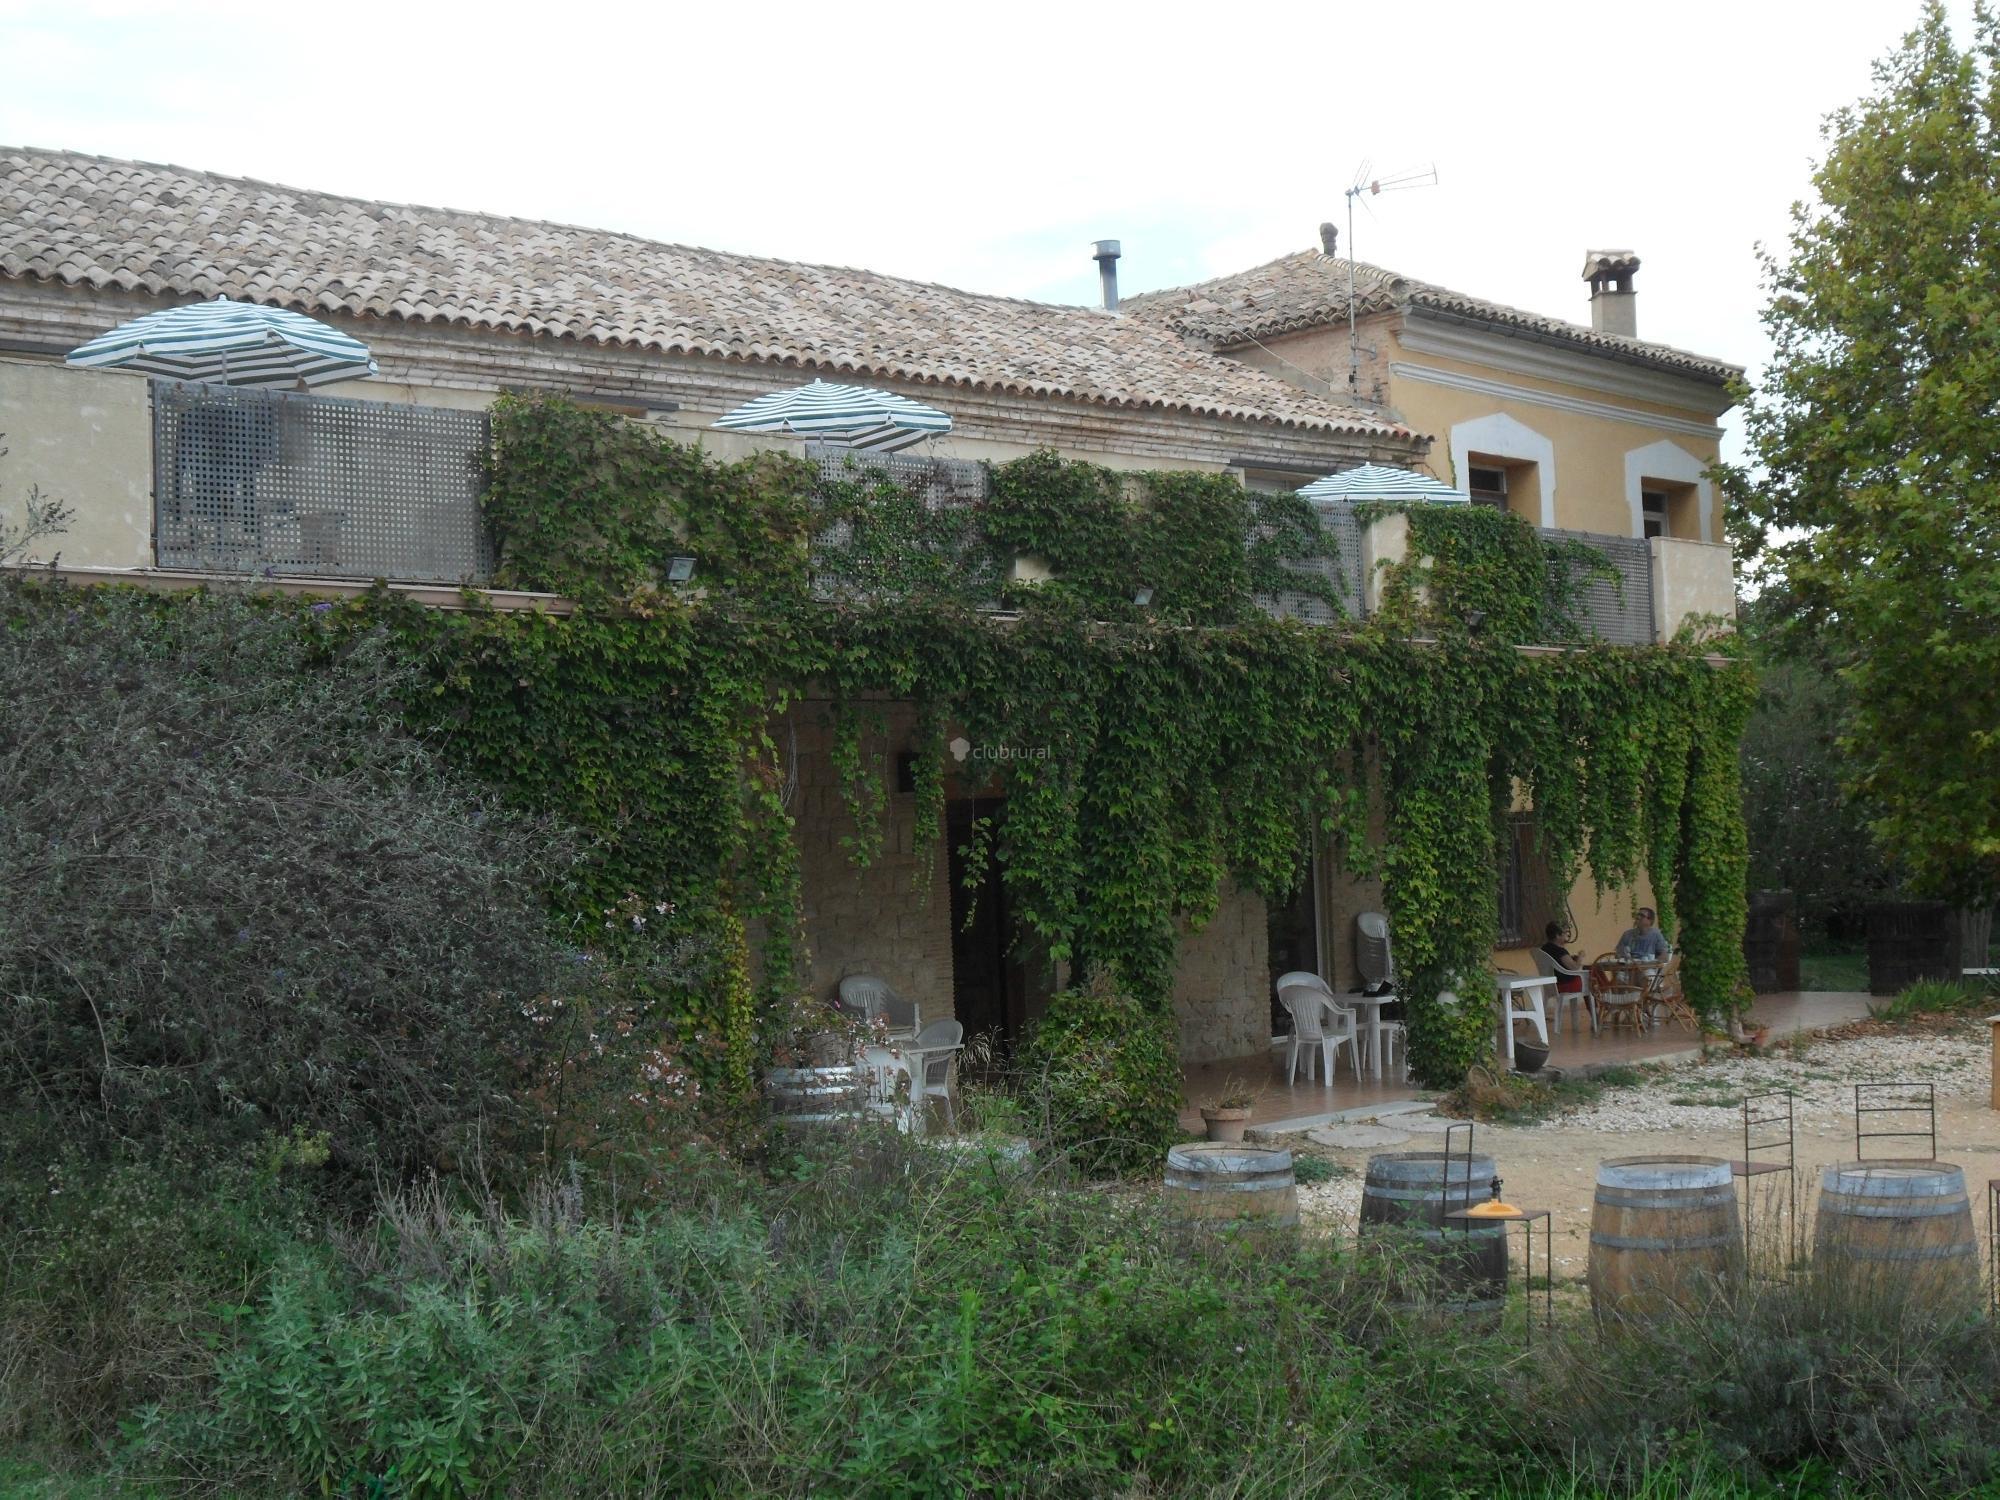 Fotos de morera valencia ontinyent clubrural - Ofertas casas rurales valencia ...